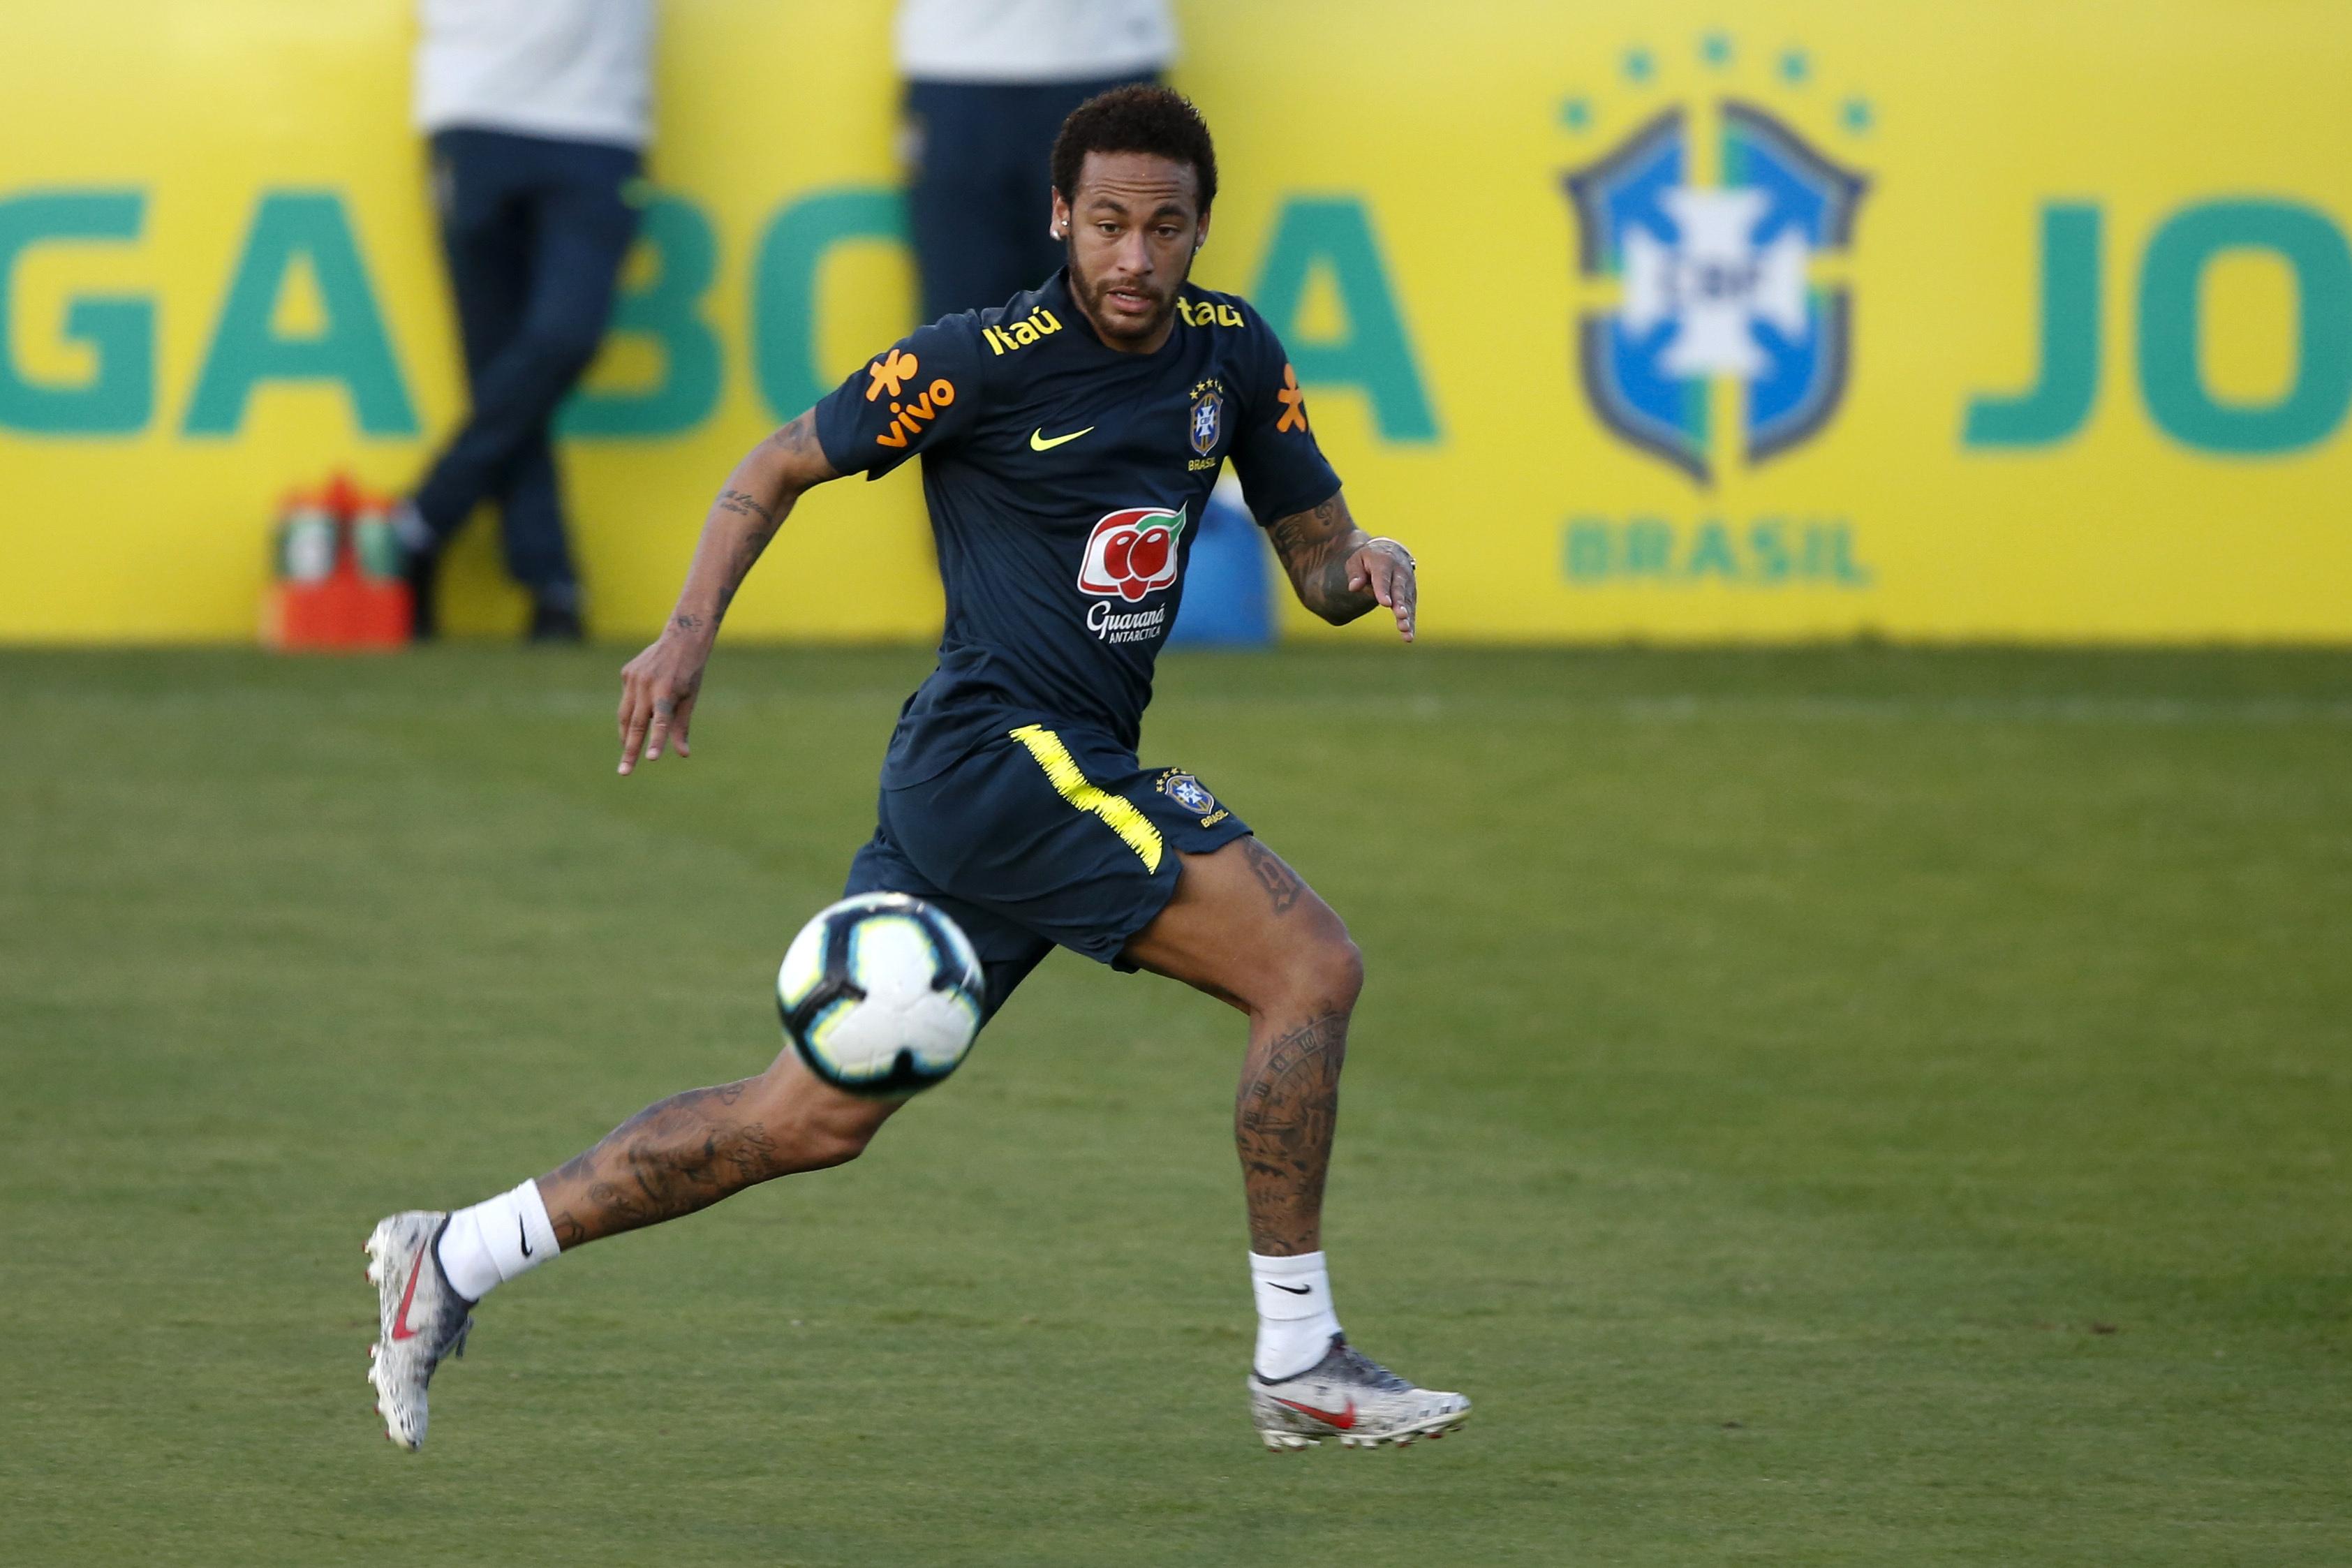 Brazilian police document says woman accuses Neymar of rape